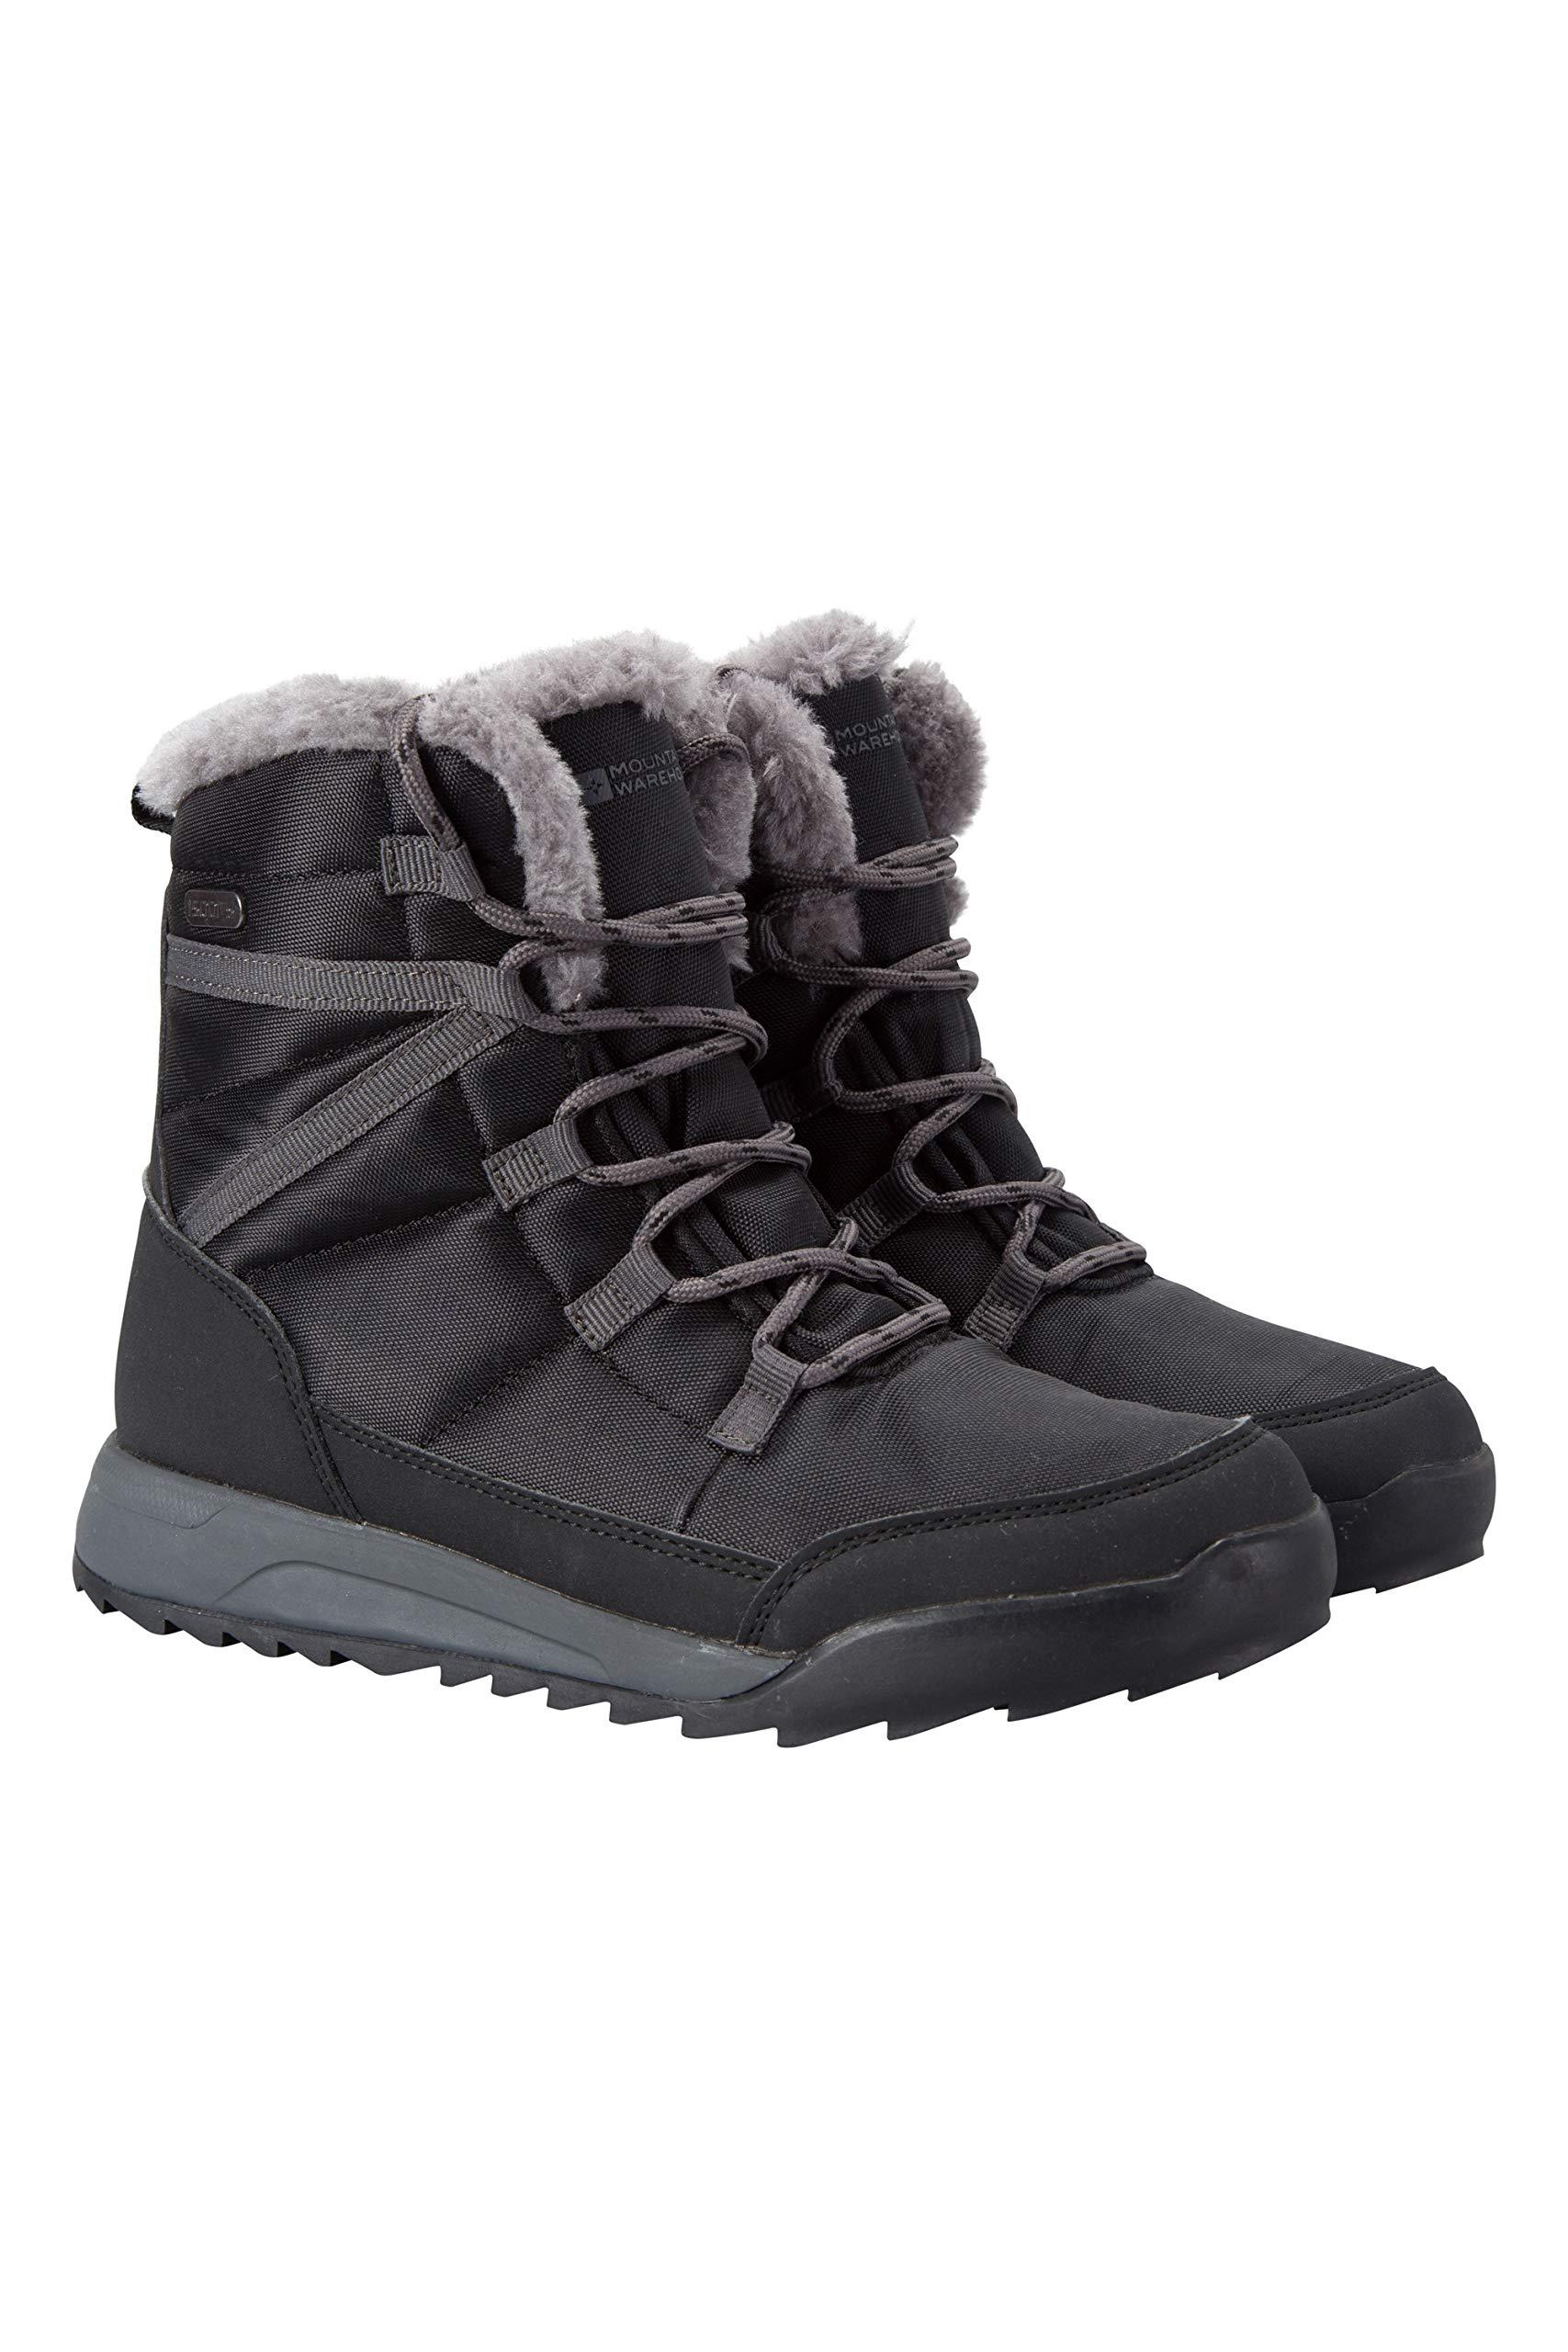 Mountain Warehouse Leisure Womens Snow Boots - Warm Winter Shoes Black 10 M US Women